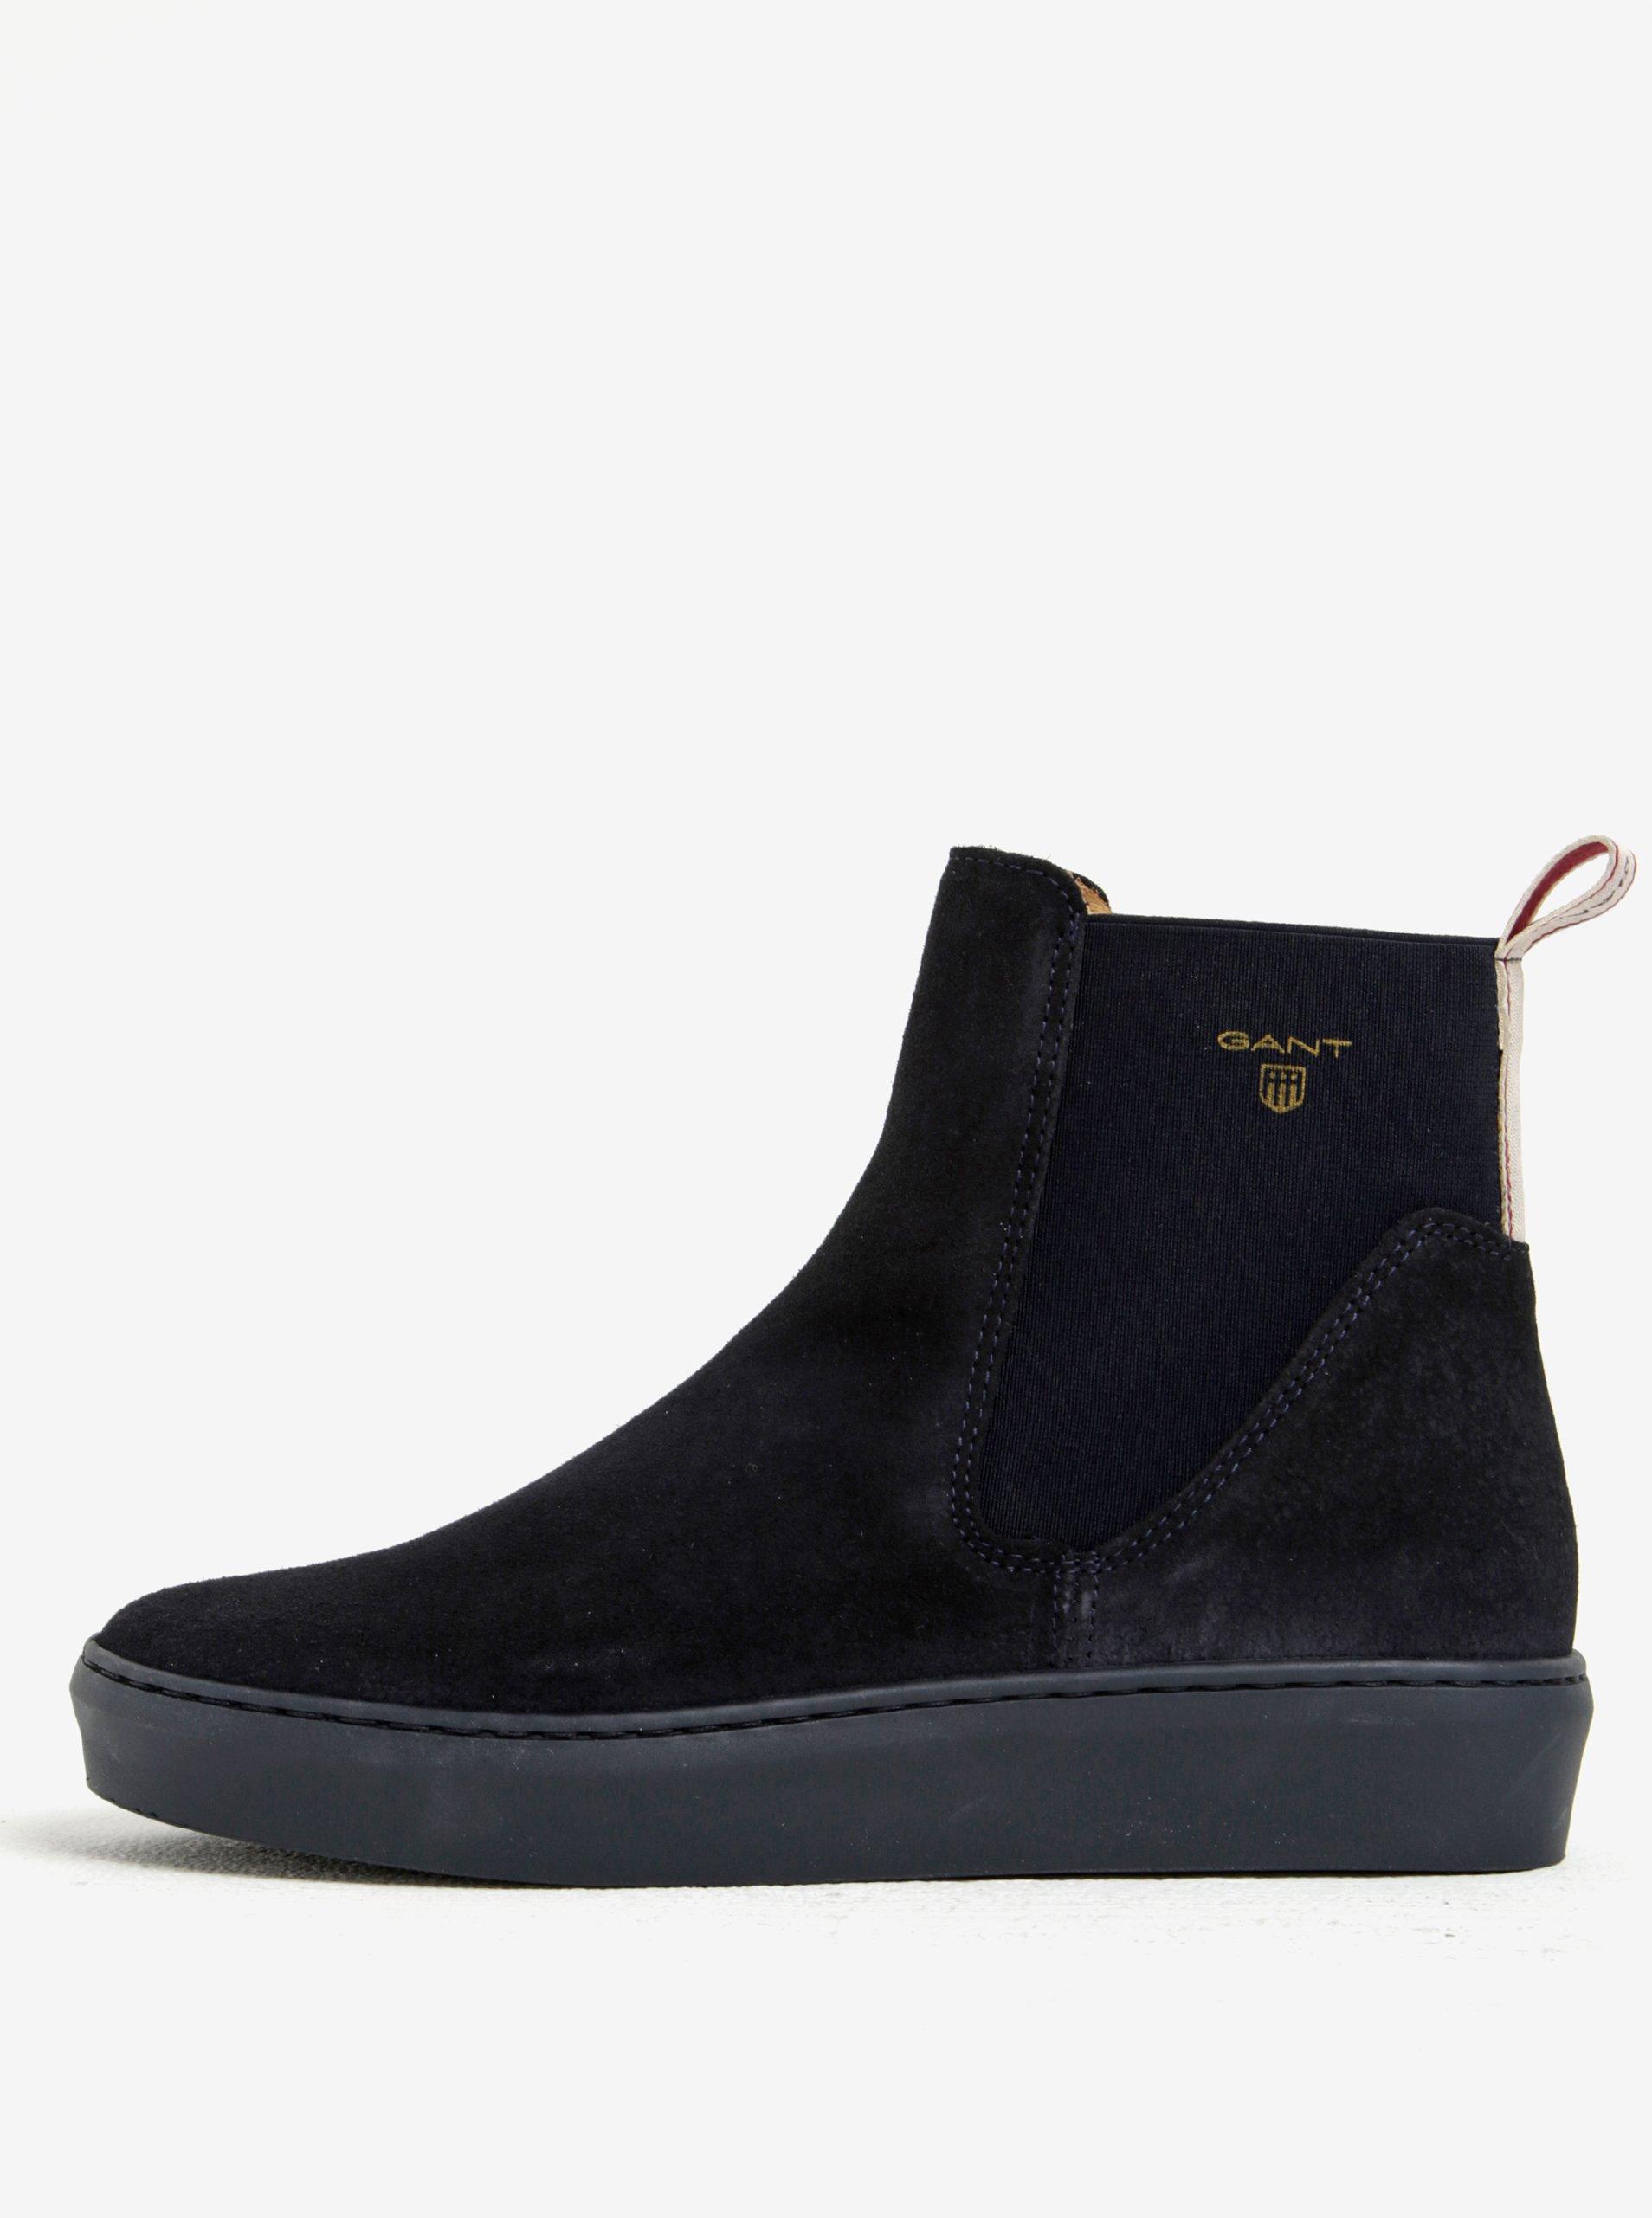 Tmavomodré dámske semišové chelsea topánky GANT Anne  293295800c1